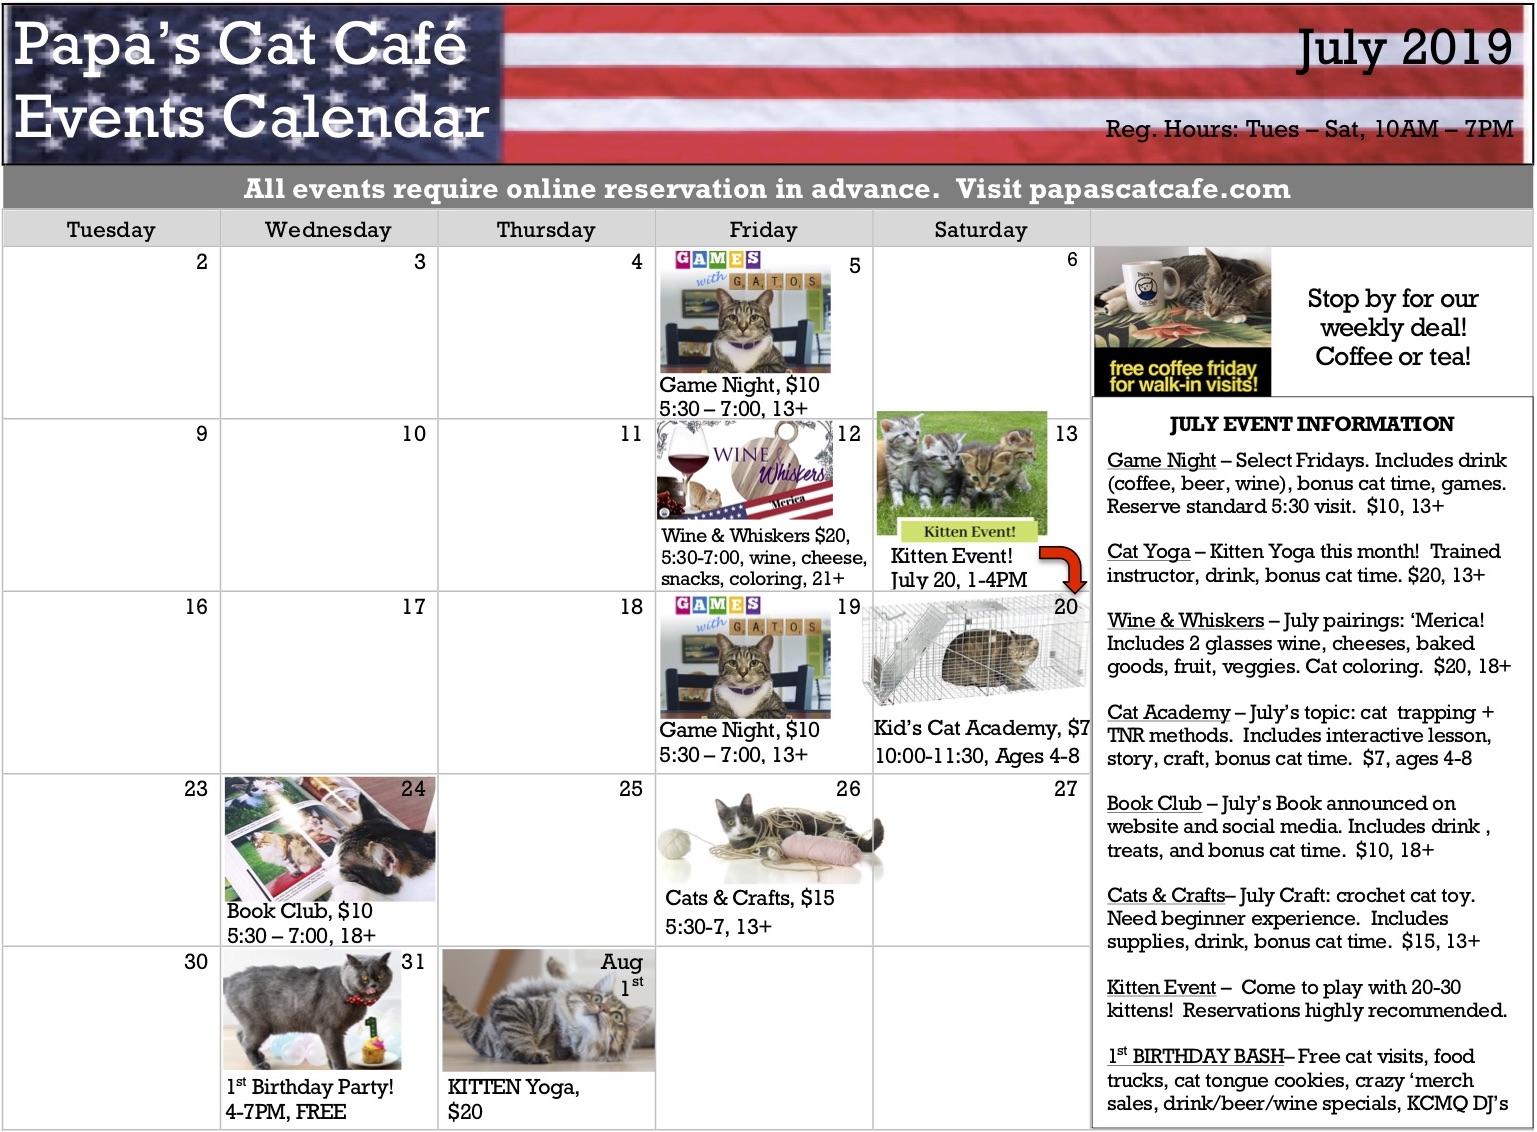 Events Calendar, July 2019